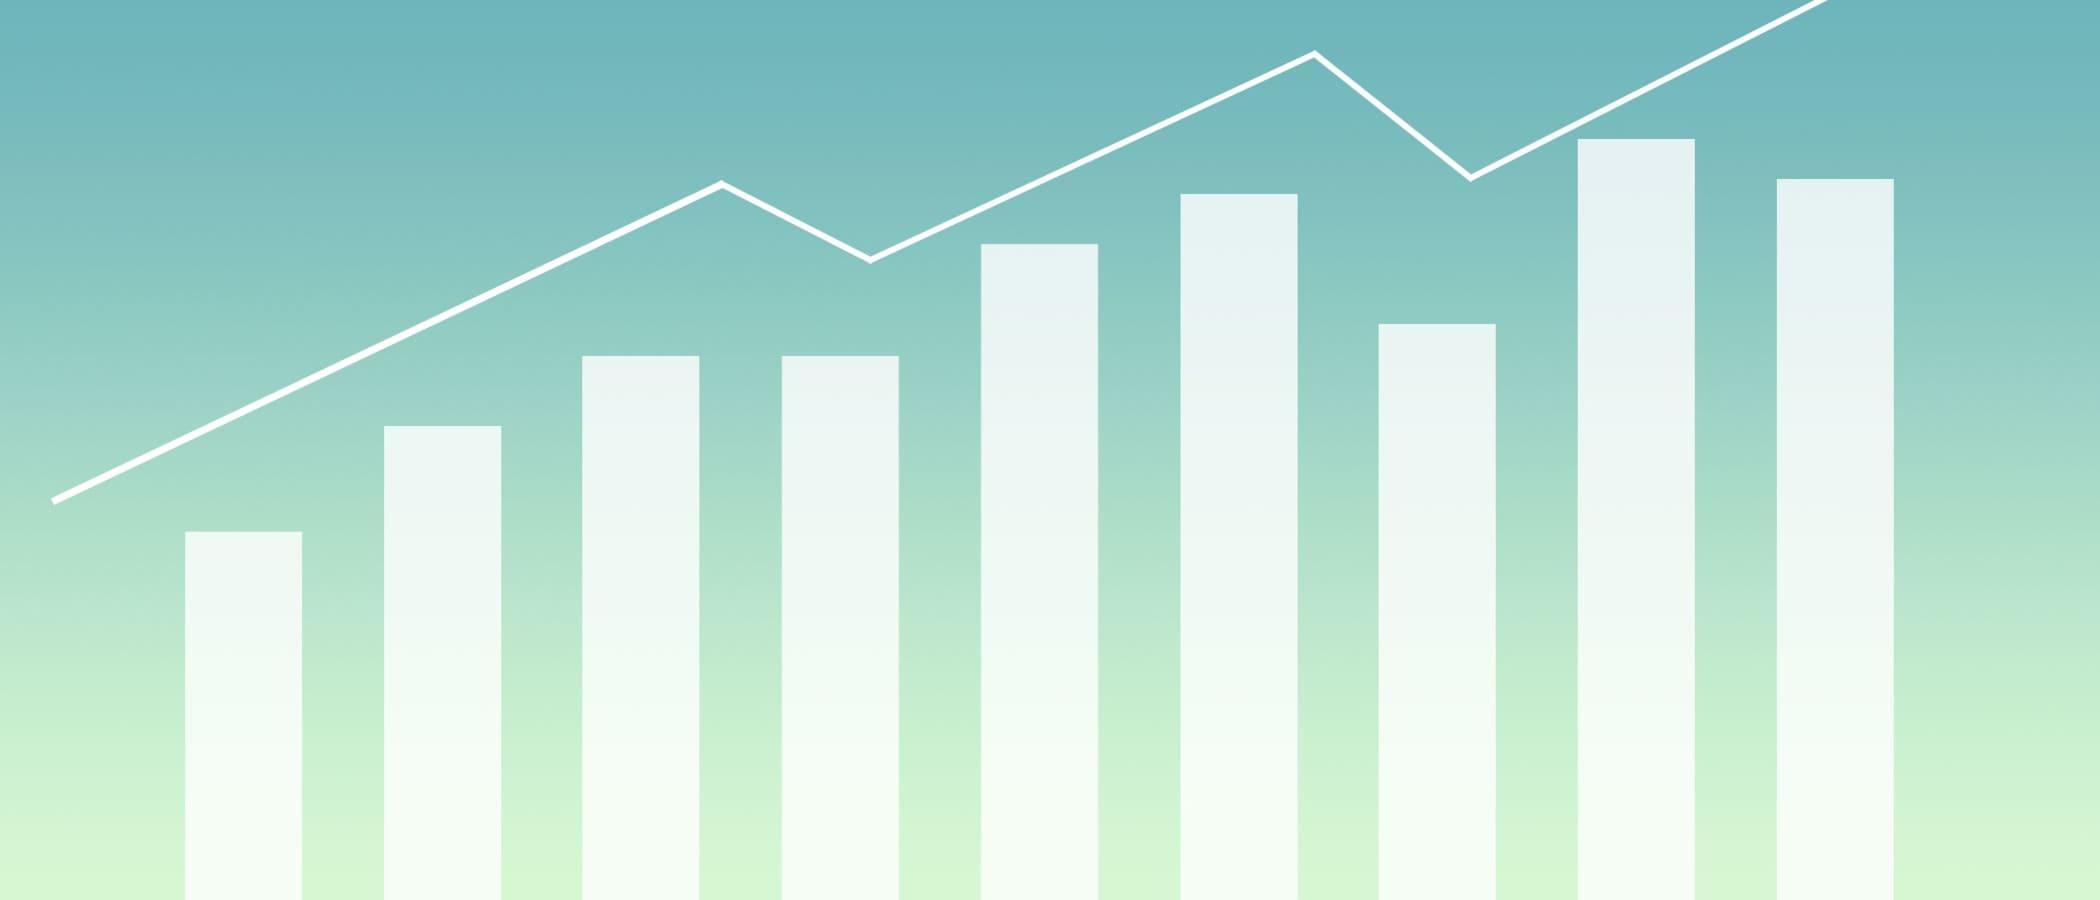 Compensation Data Center – Salary Survey Template